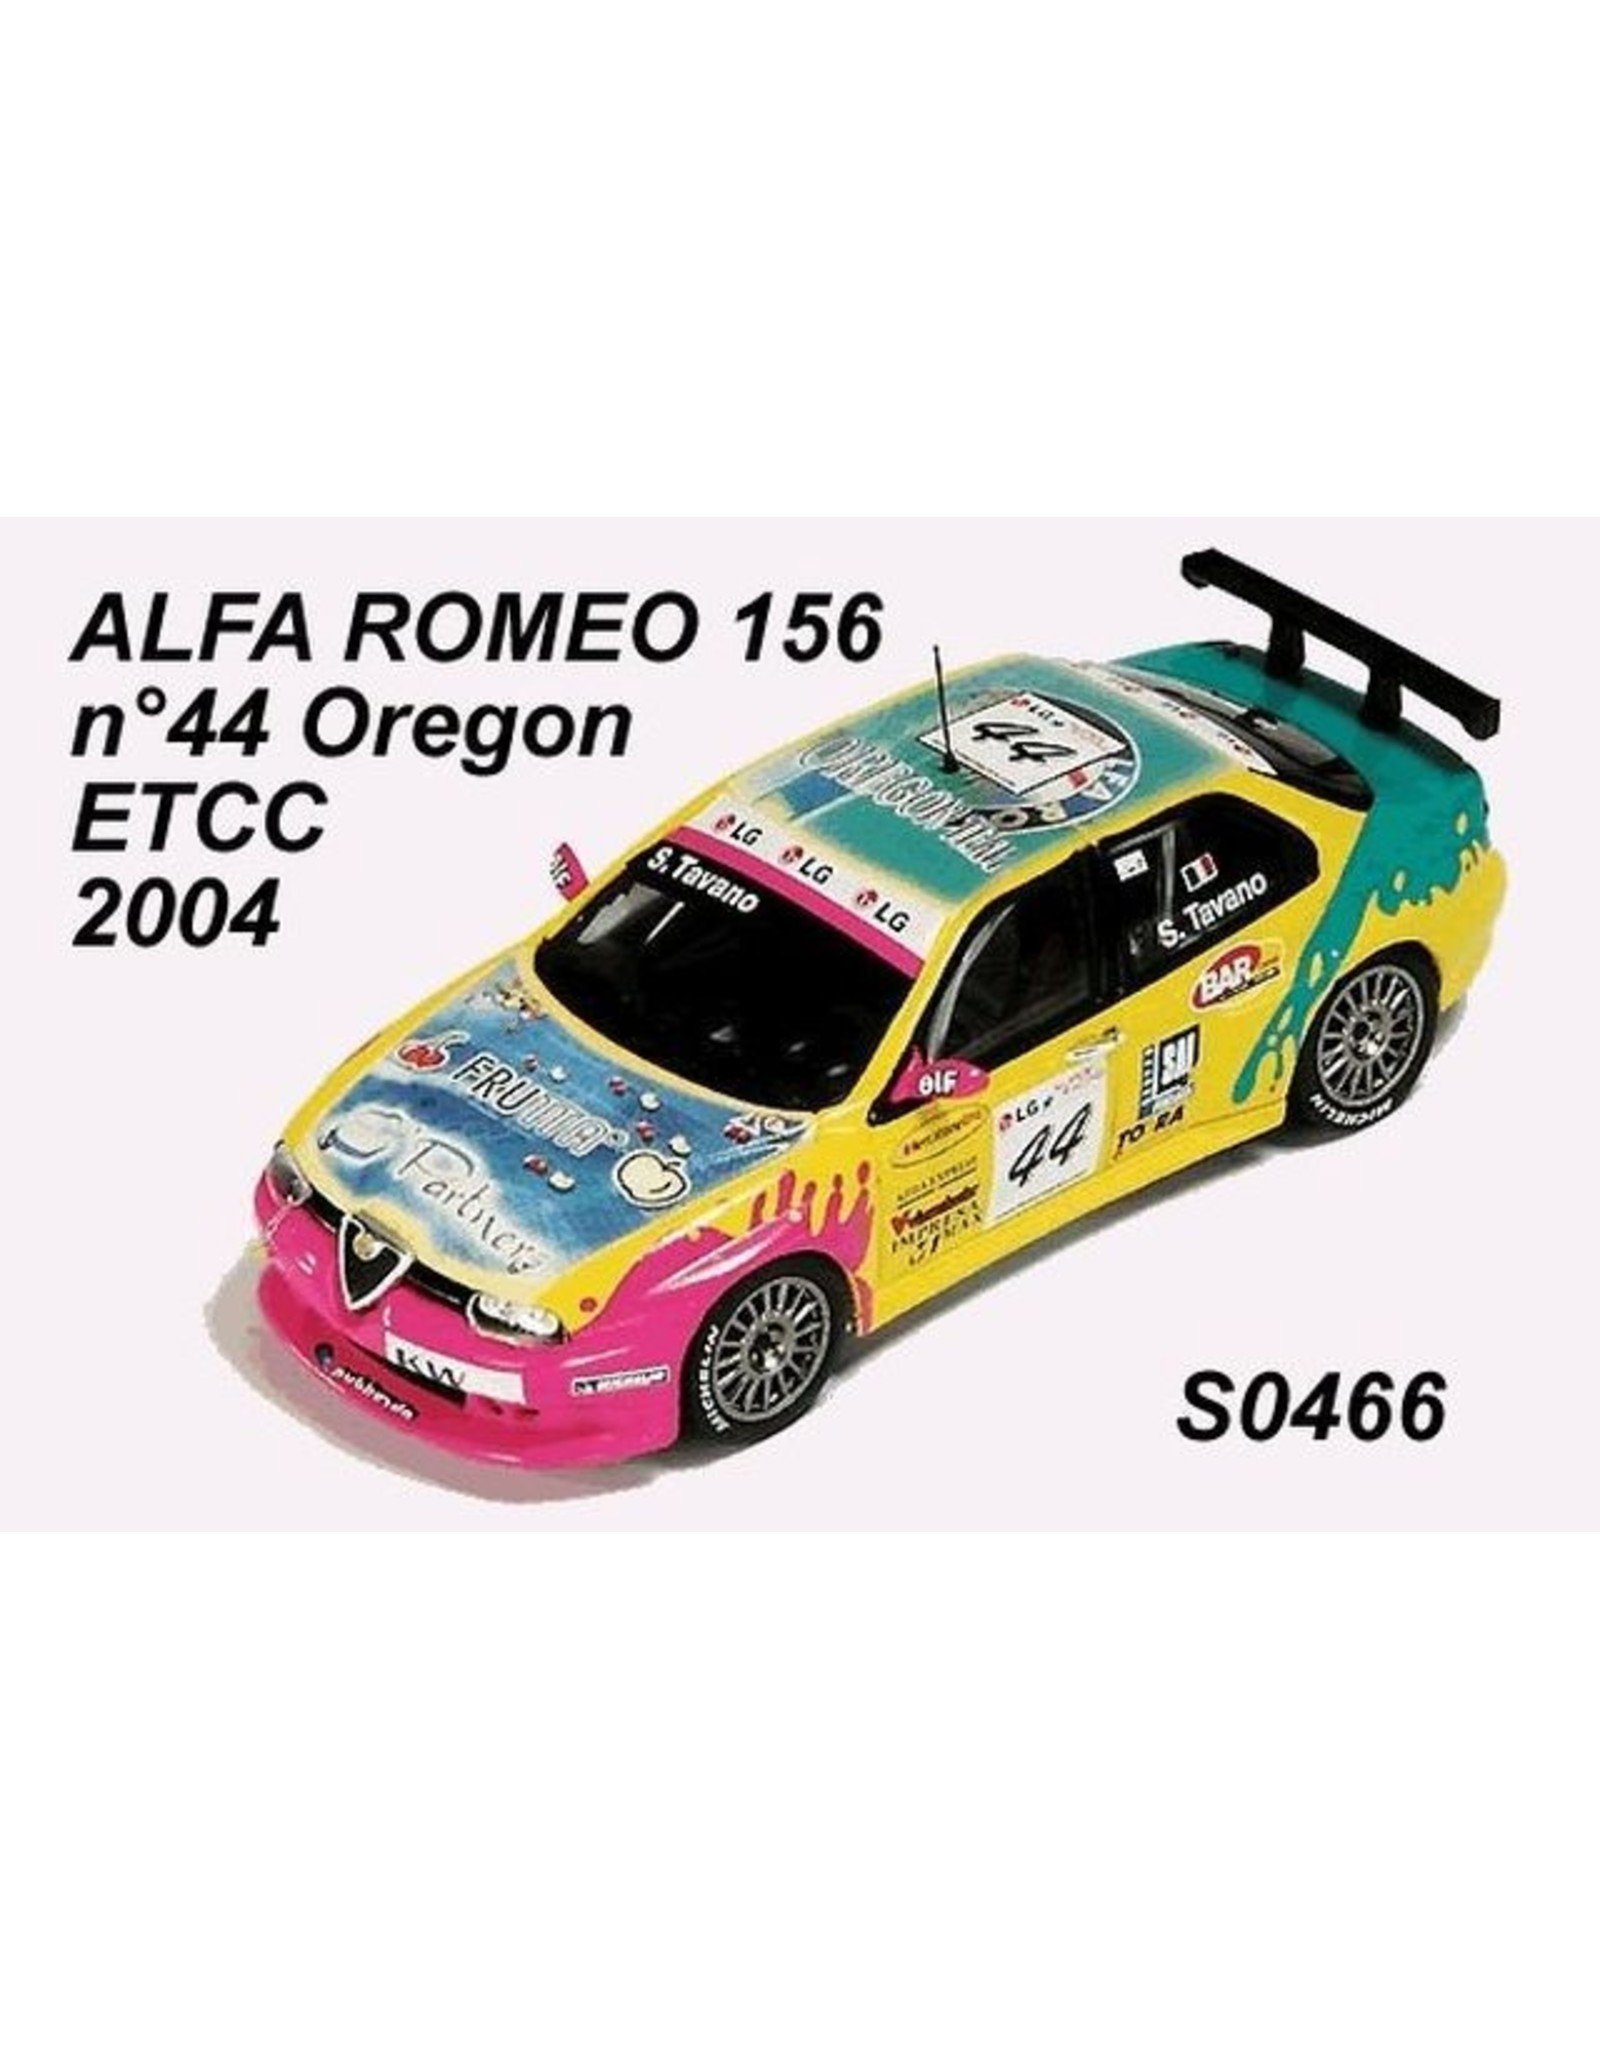 Alfa Romeo ALFA ROMEO 156 GTA #44(S.Tavano)TEAM OREGON ETCC 2004